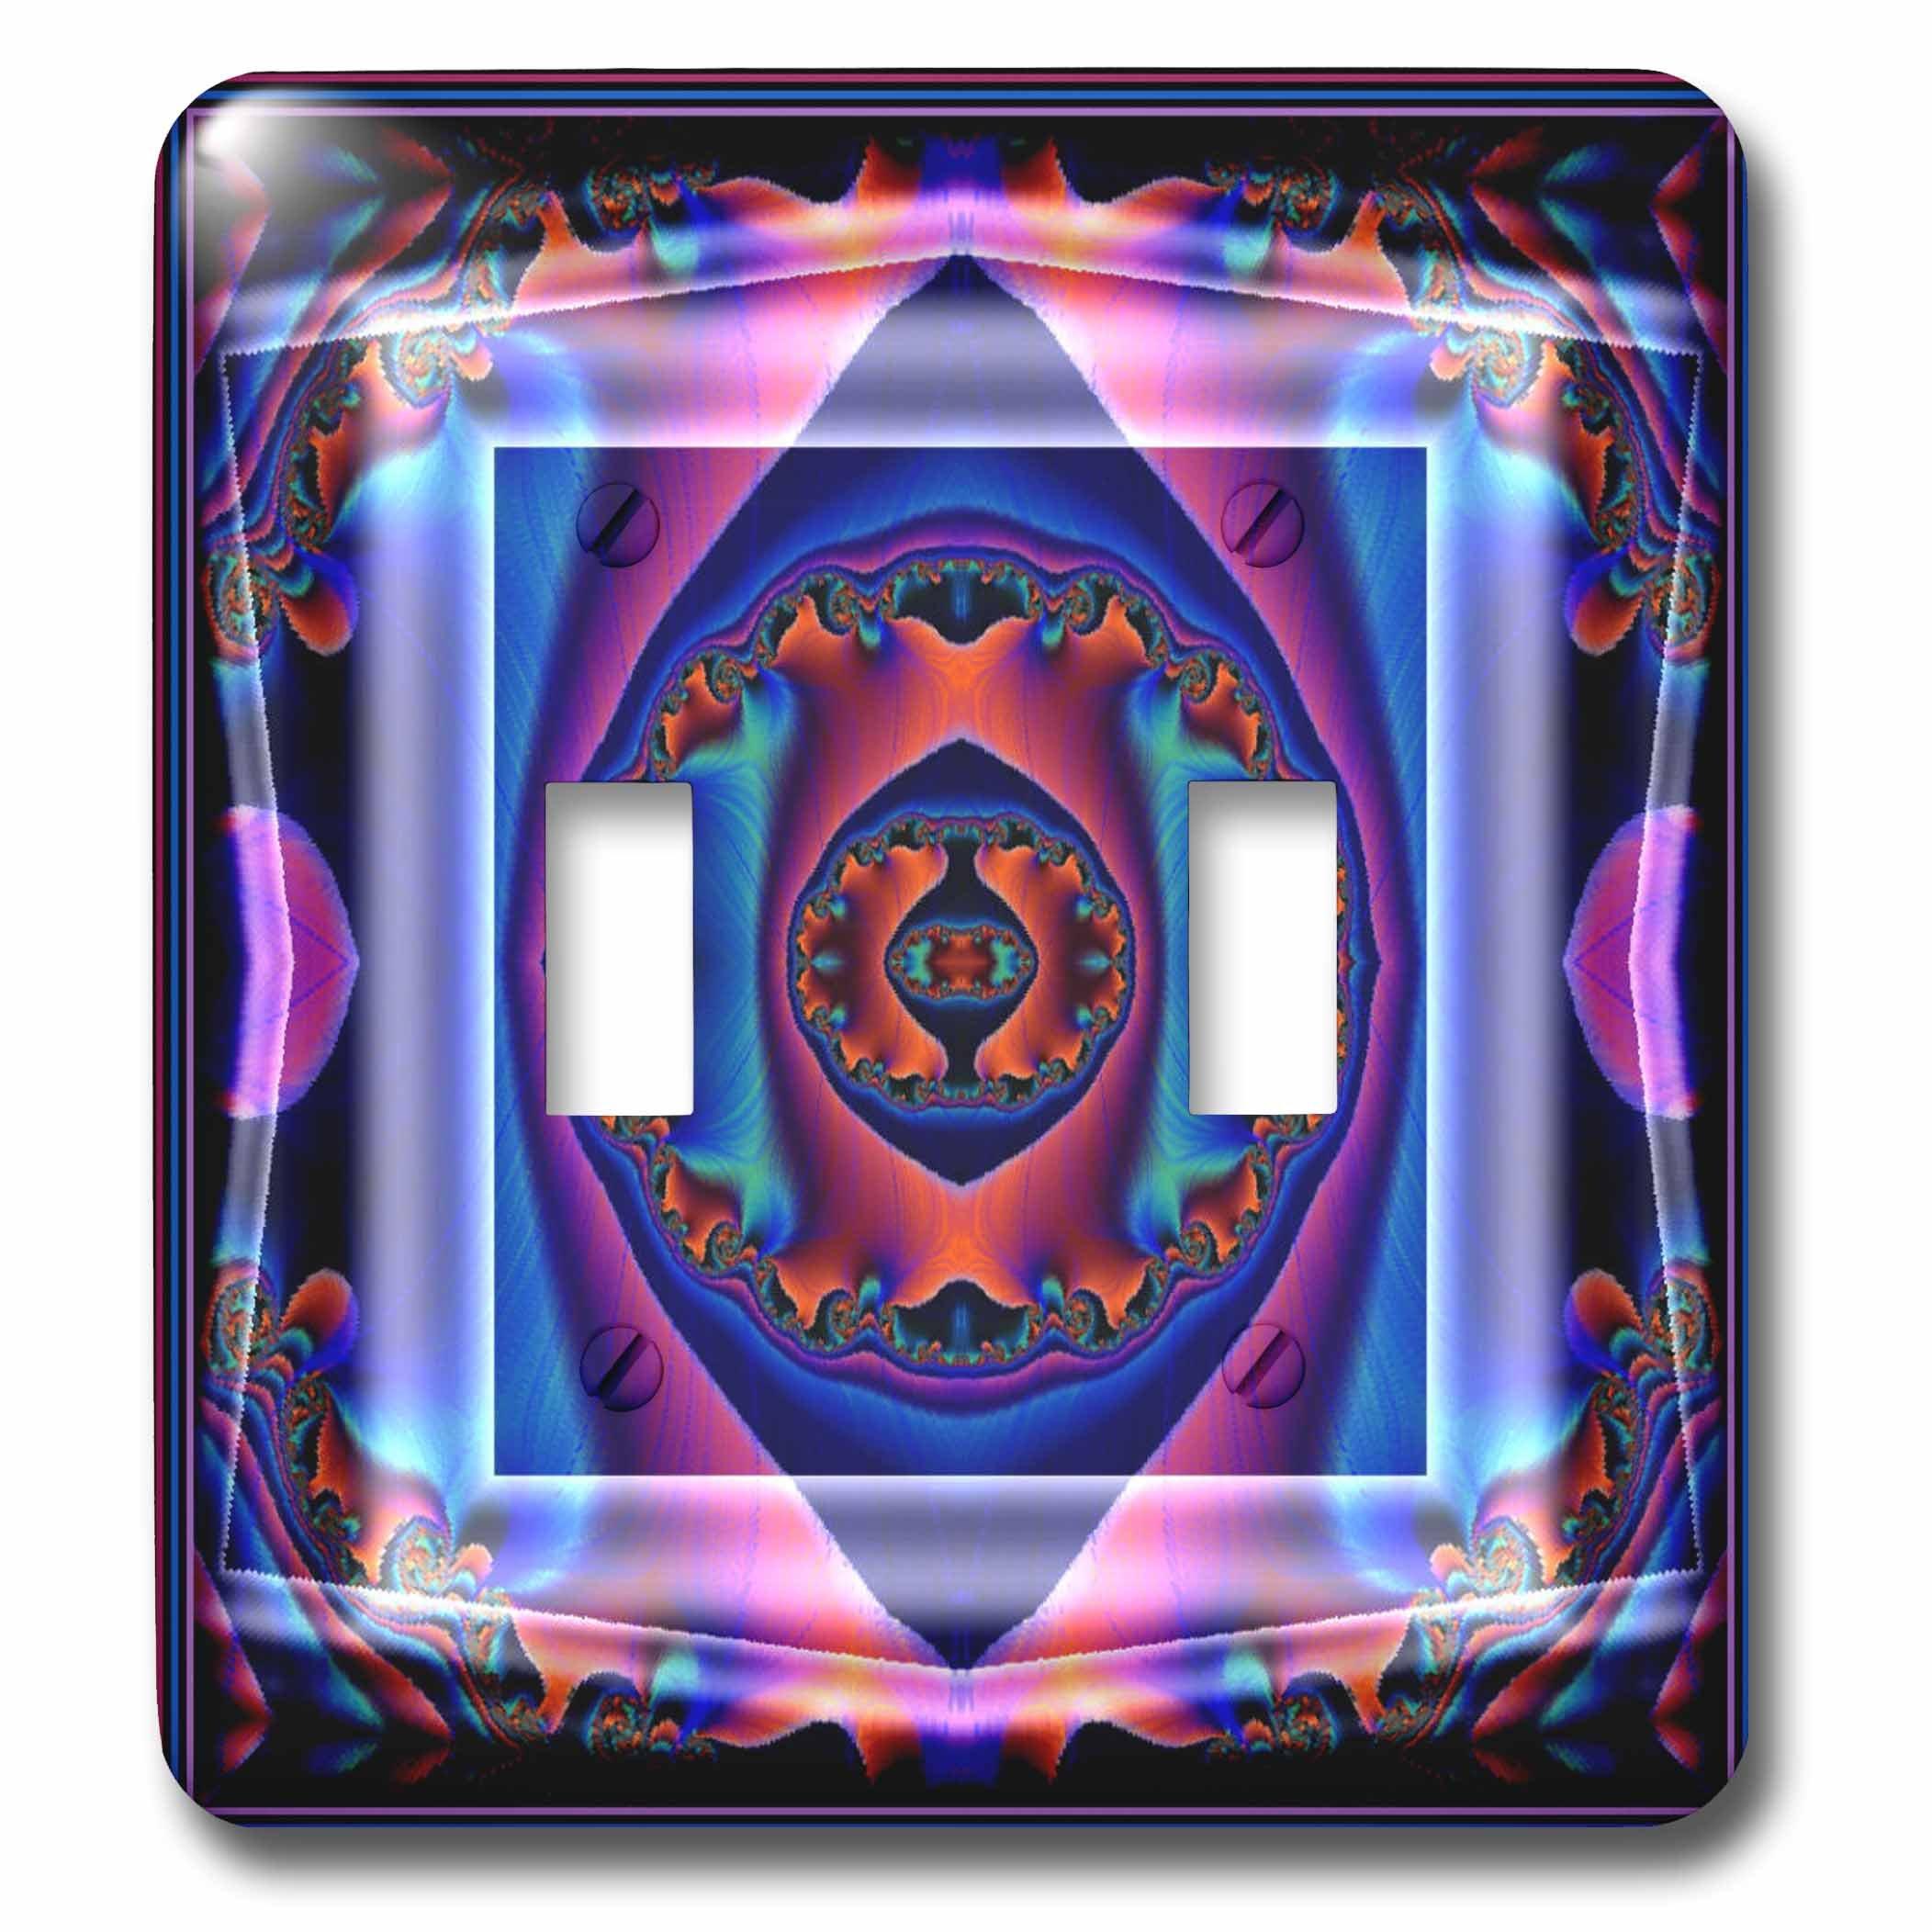 3dRose lsp_26762_2 Mandala Blue Meditation Orient India Inner Harmony Peace Chakra New Age Spirituality Flower Power Double Toggle Switch